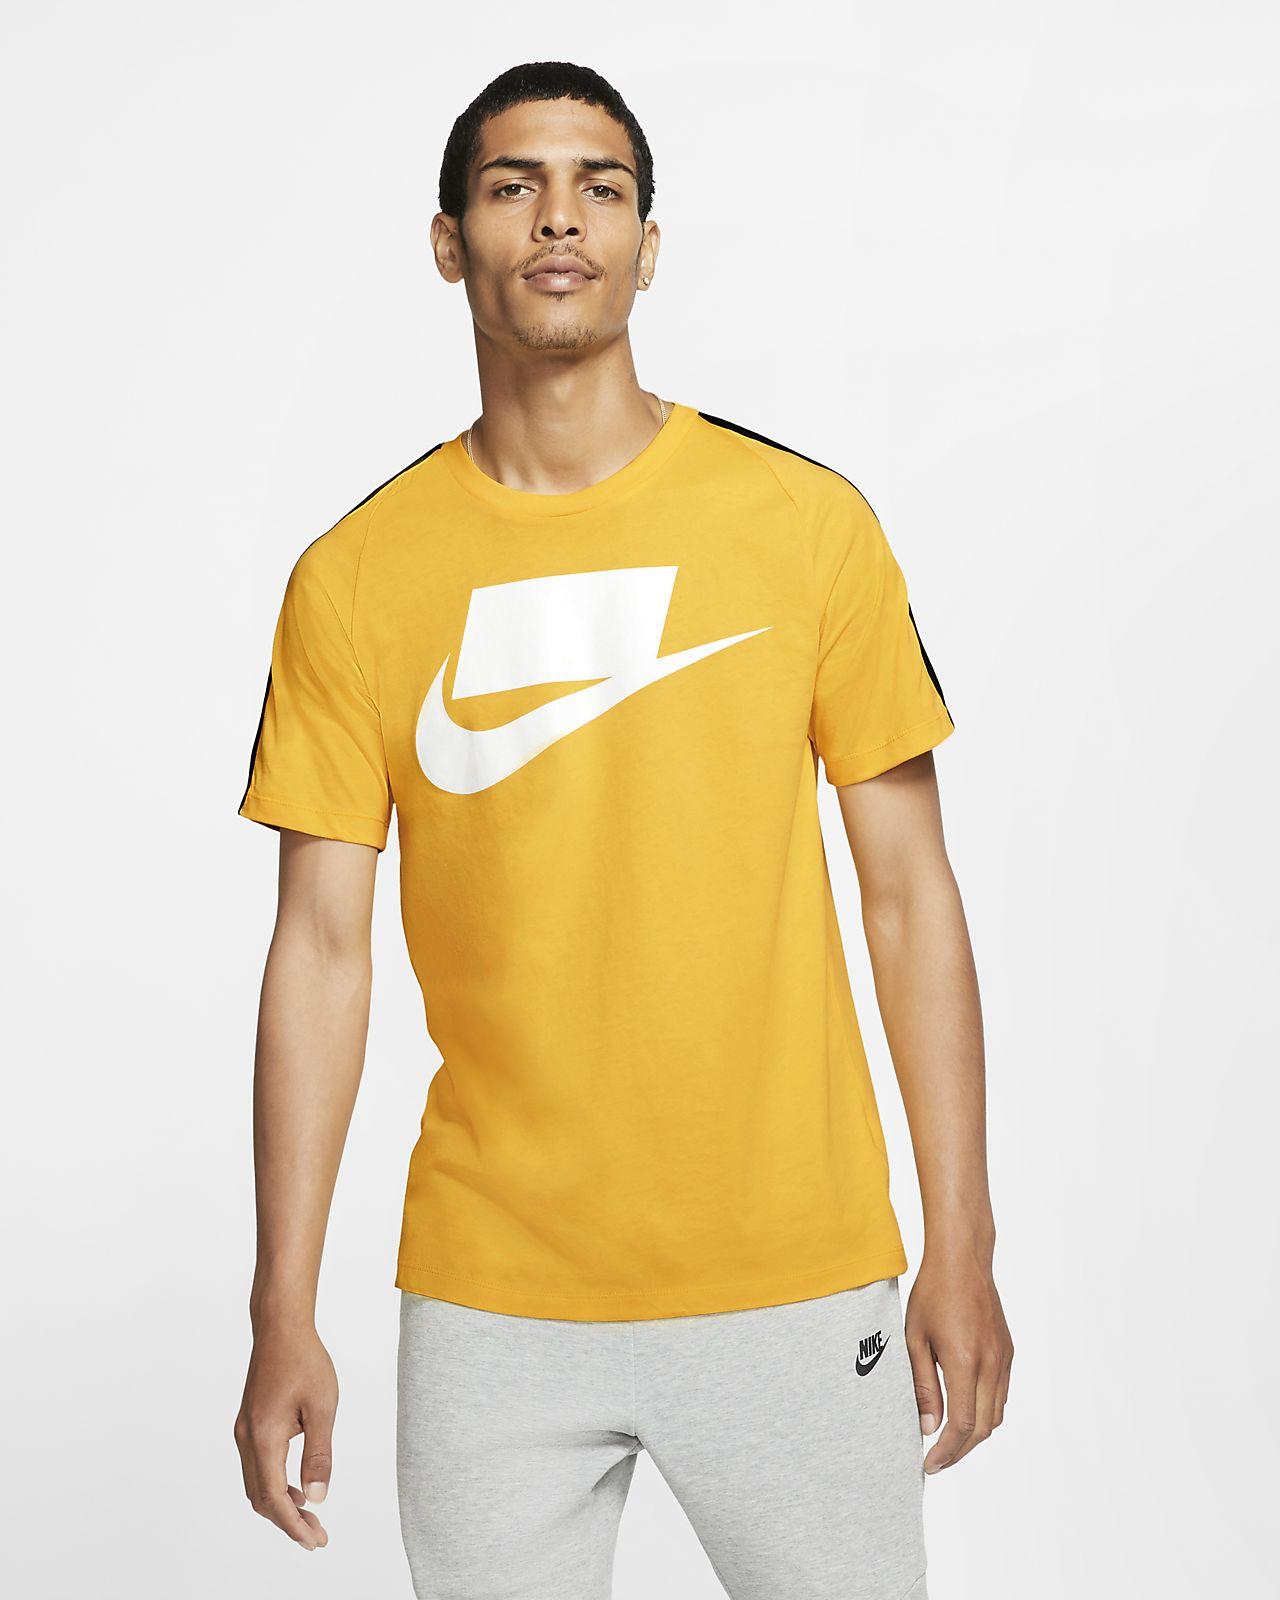 Nike Sportswear NSW T-shirt voor heren